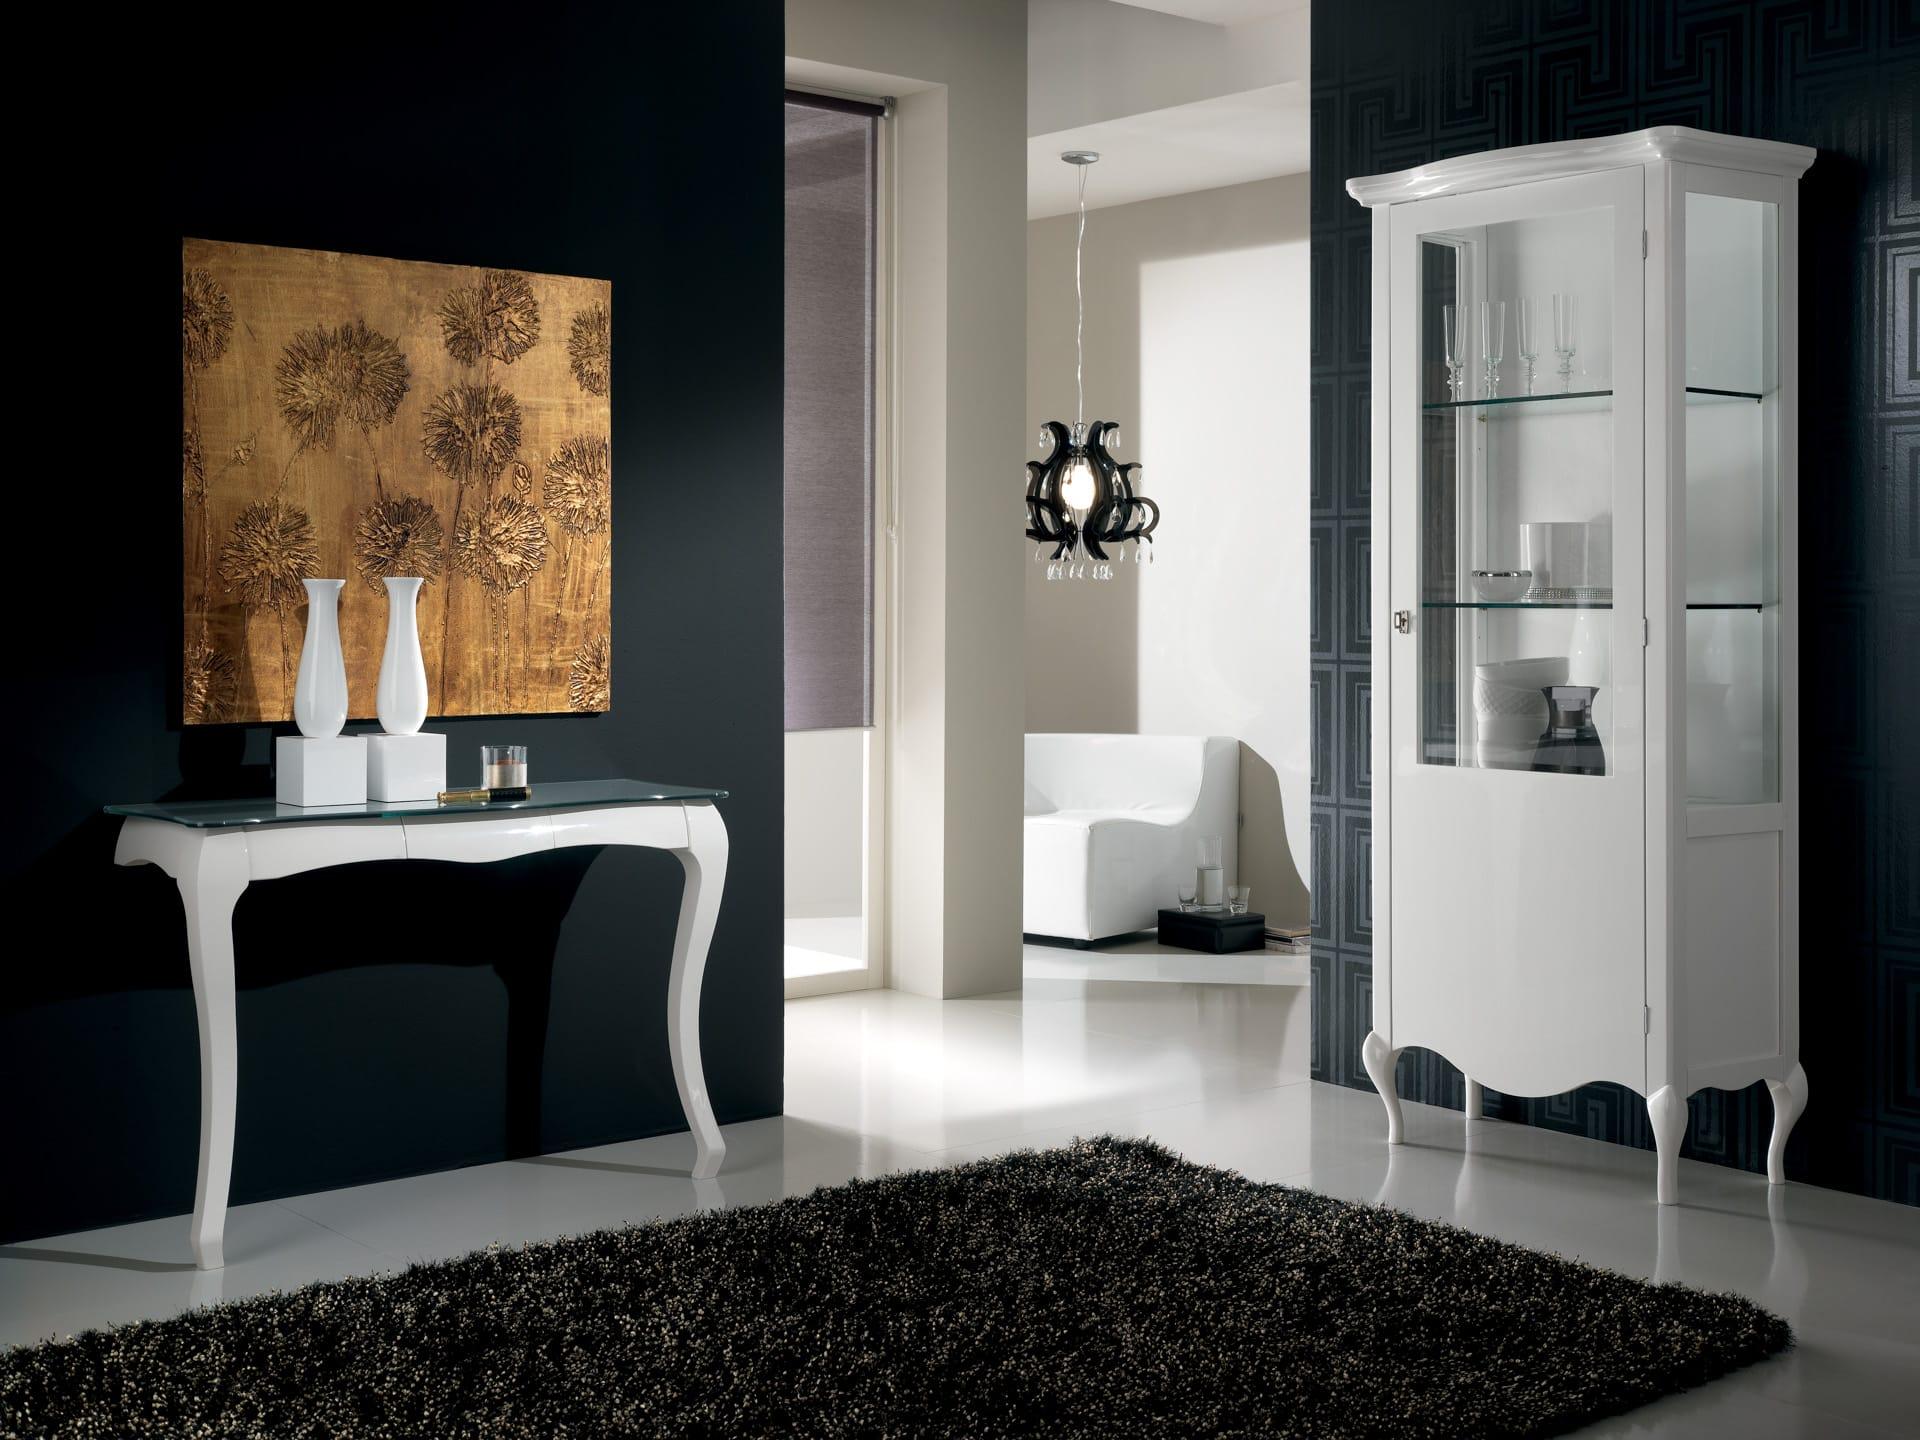 Matisse - Gallery 10